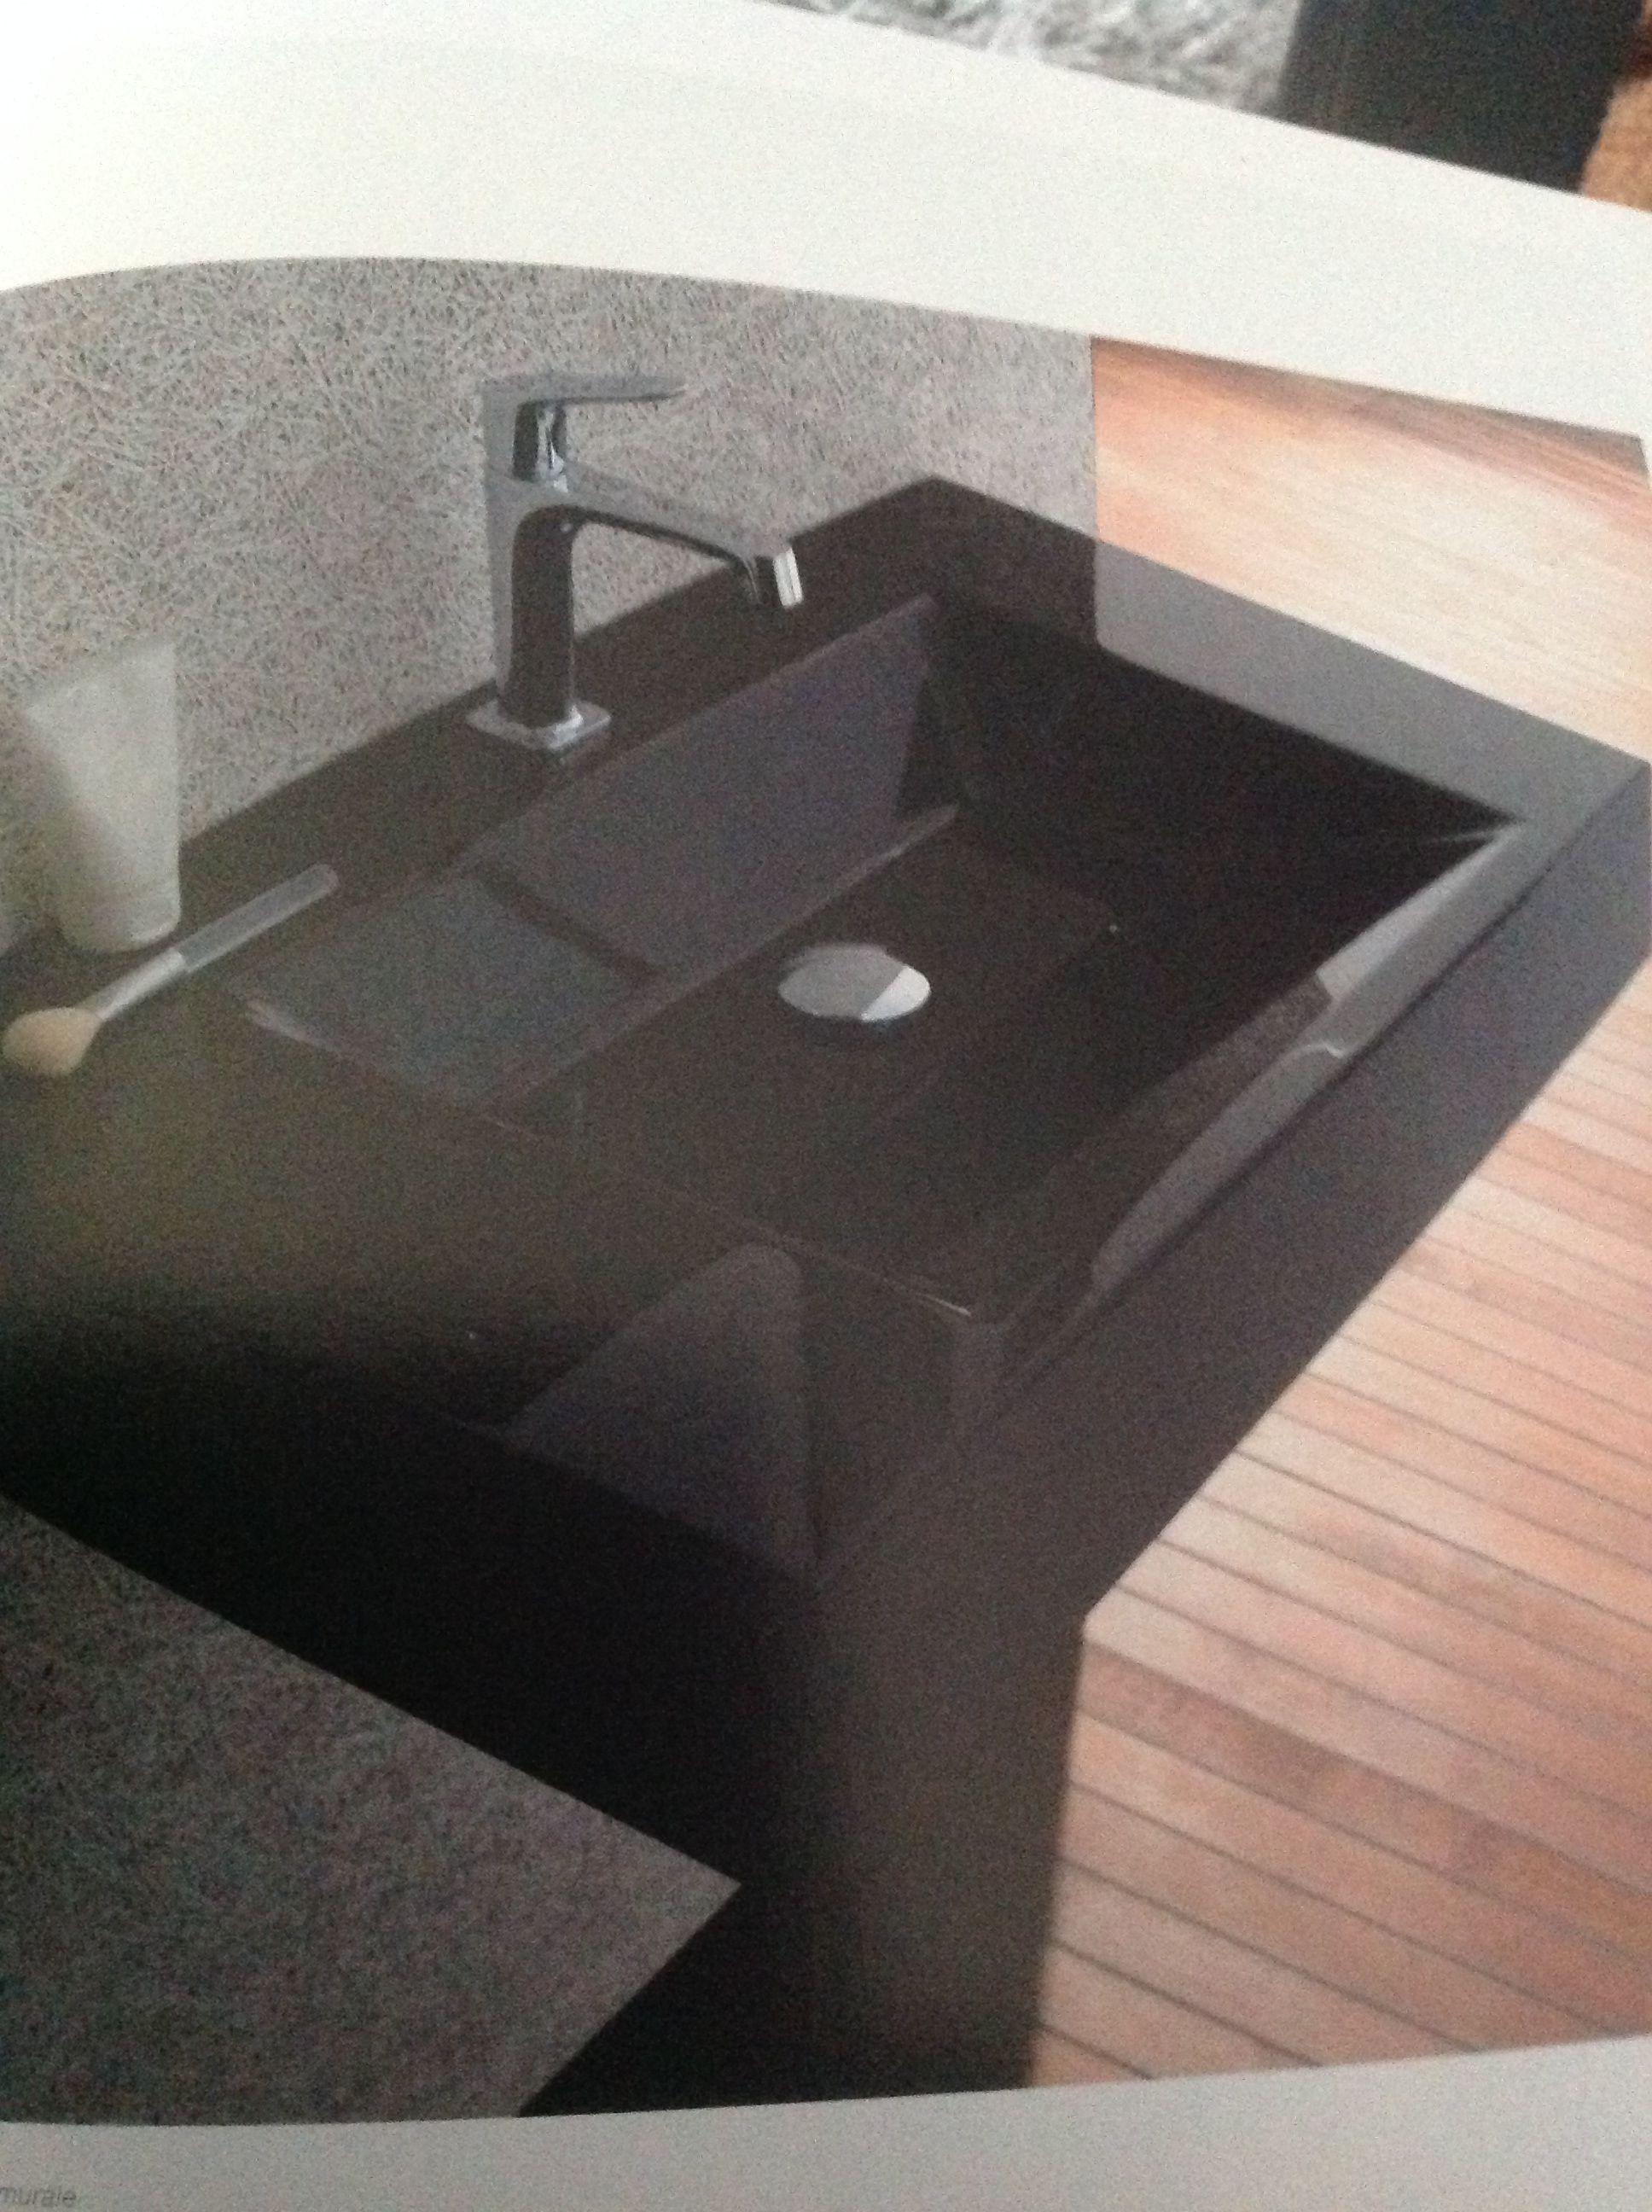 spotjes betonnen wasbak badkamer betonnen design wastafel lavabo van